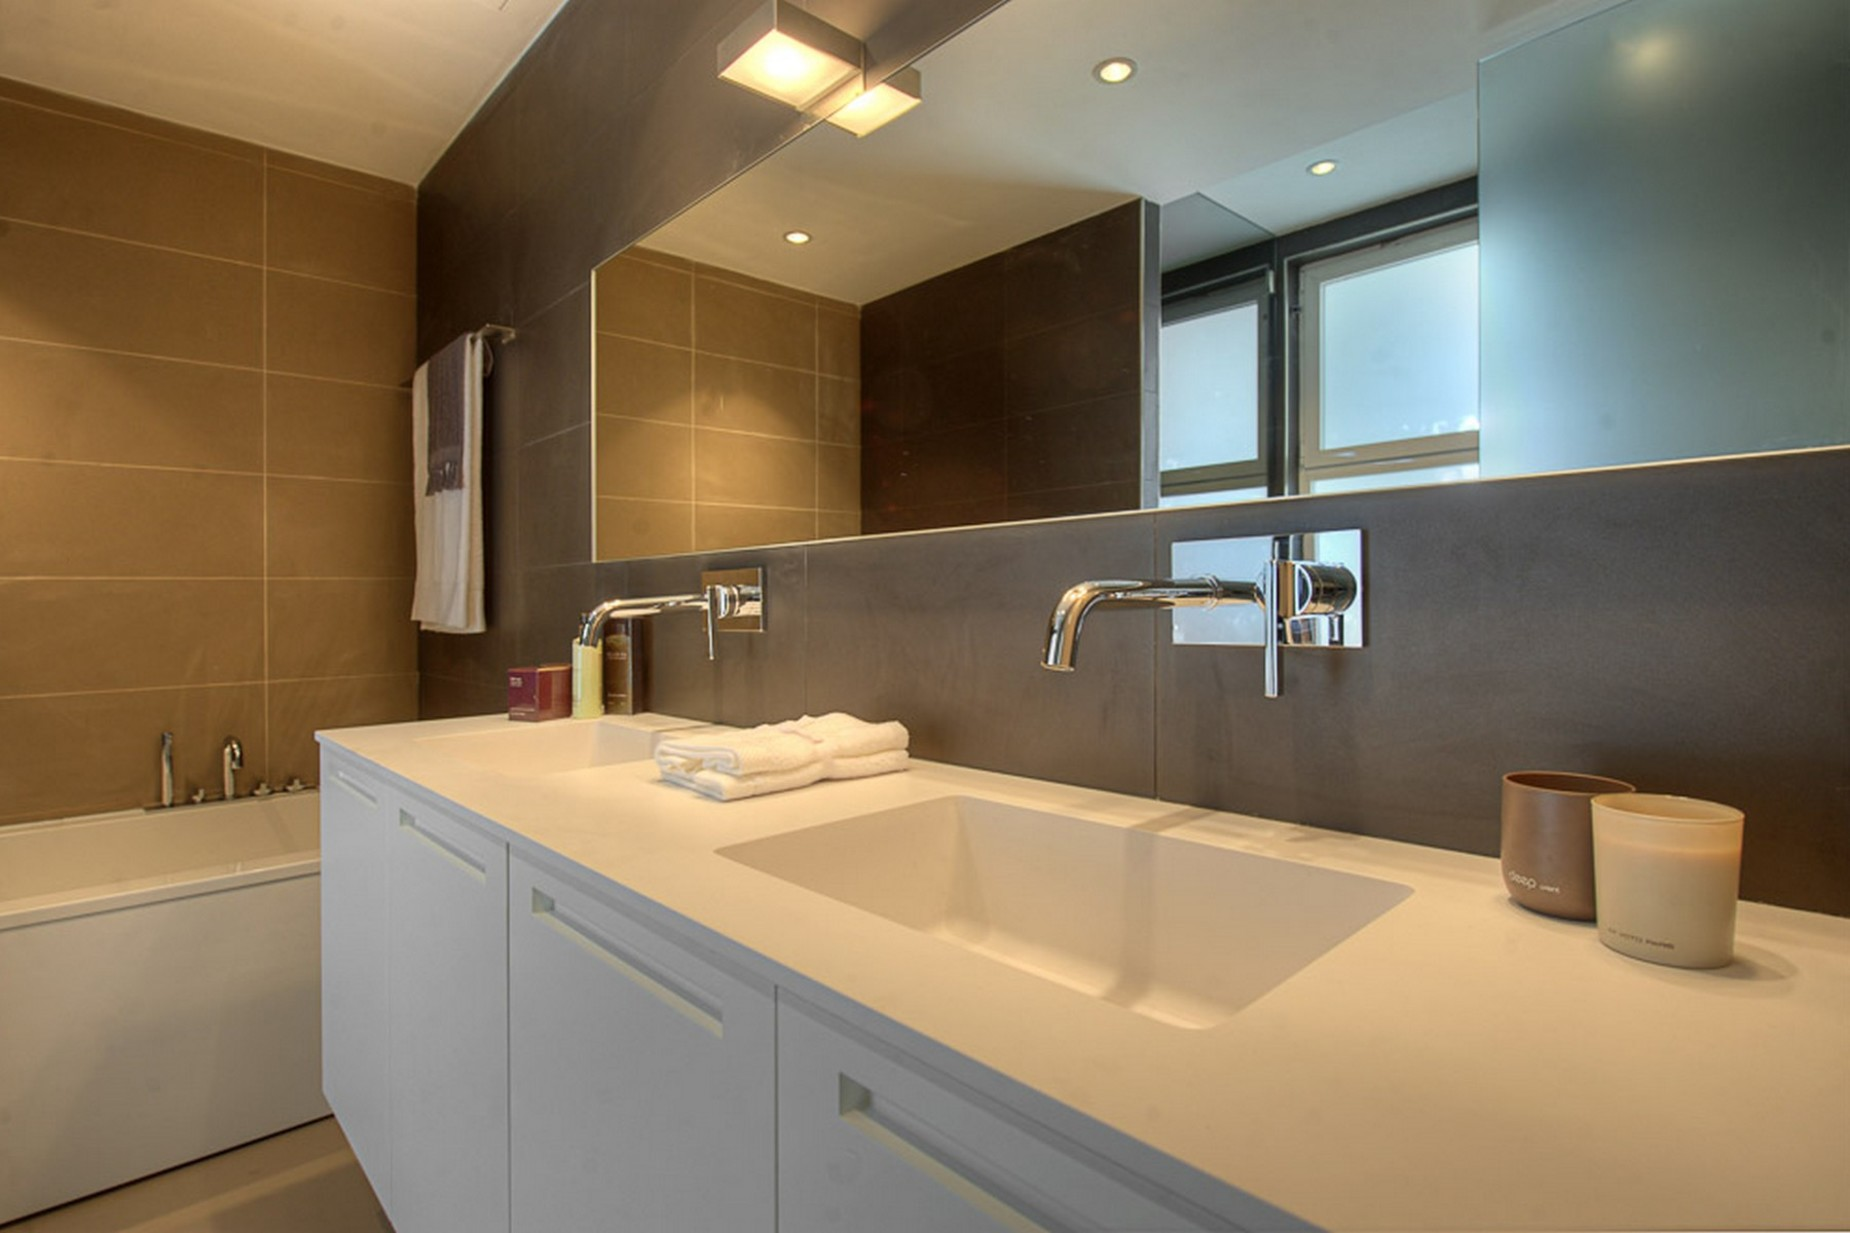 3 bed Villa For Sale in Bahar ic-Caghaq, Bahar ic-Caghaq - thumb 15